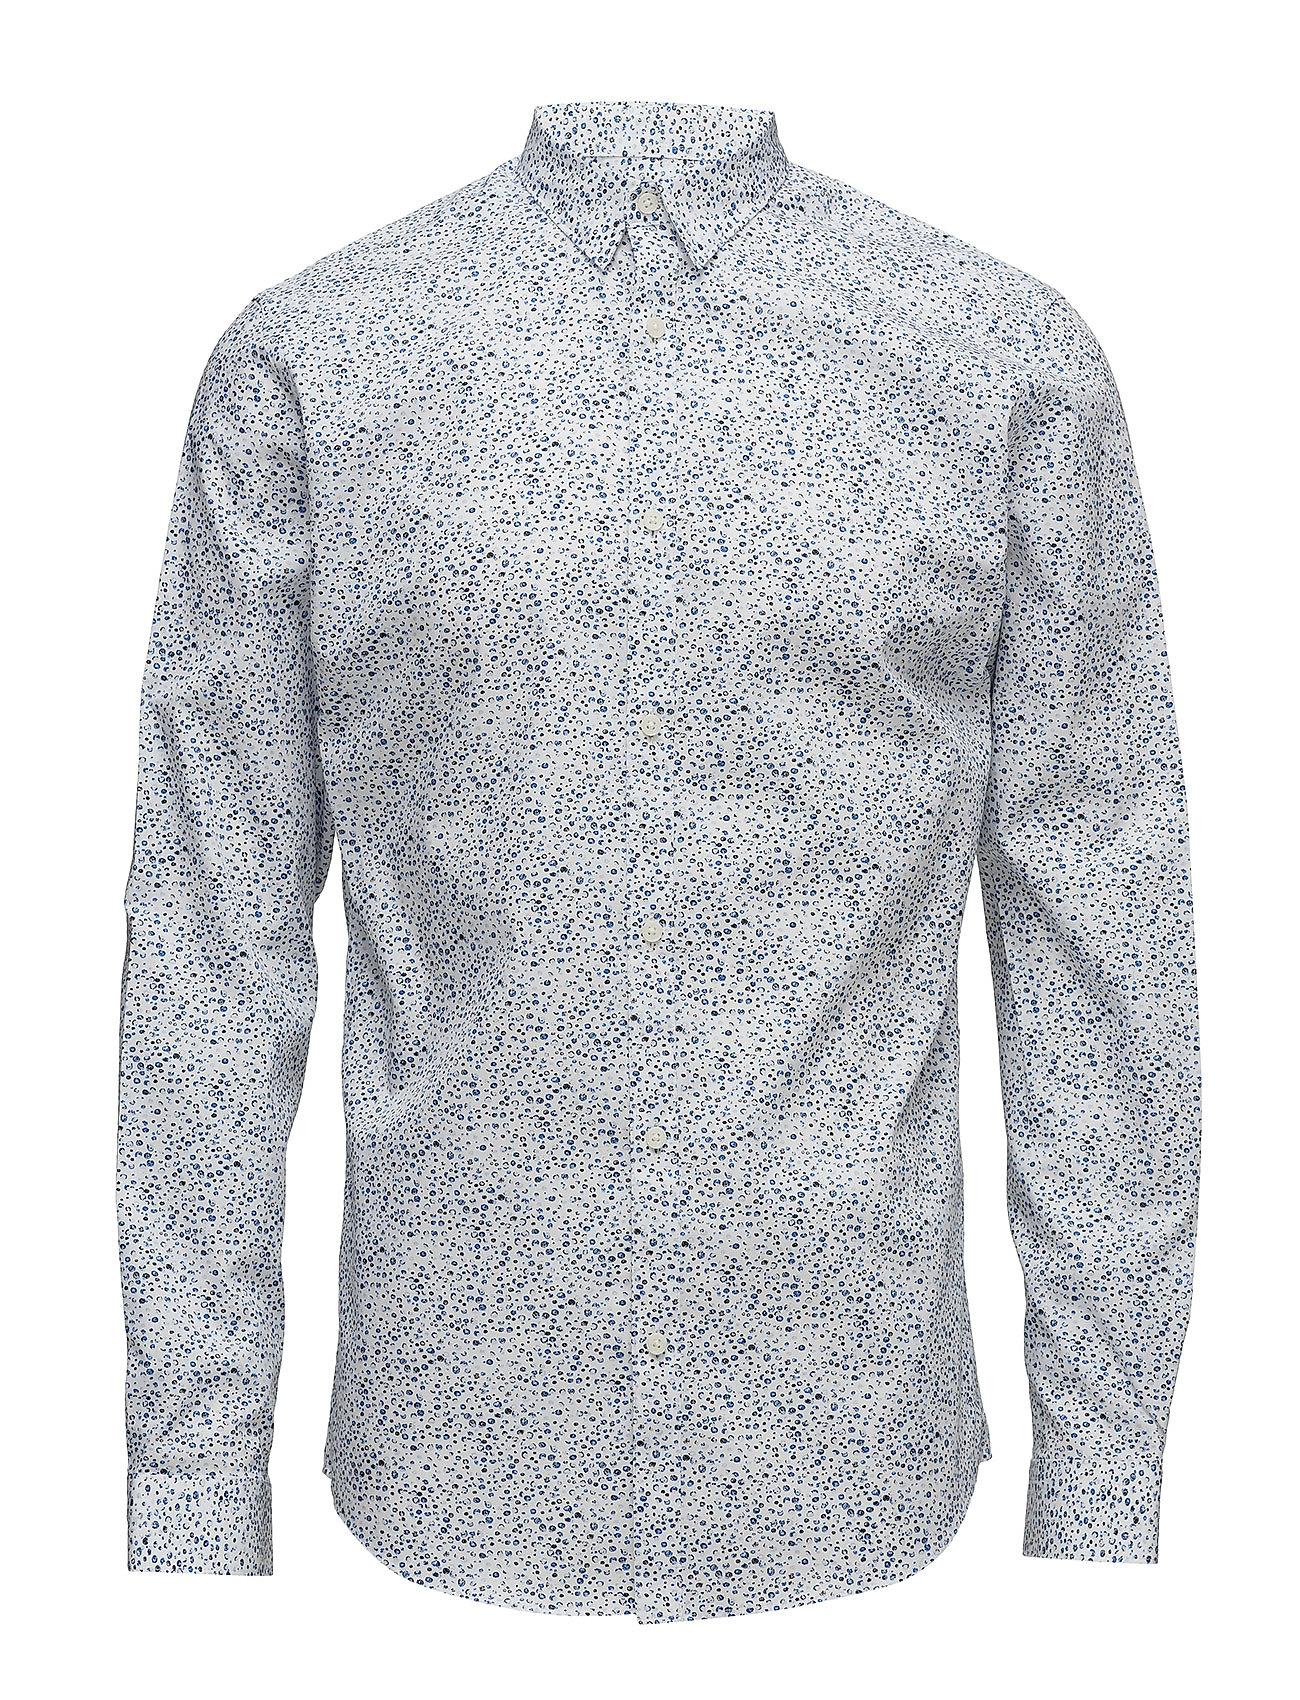 jack & jones premium – Jprhope shirt l/s plain på boozt.com dk